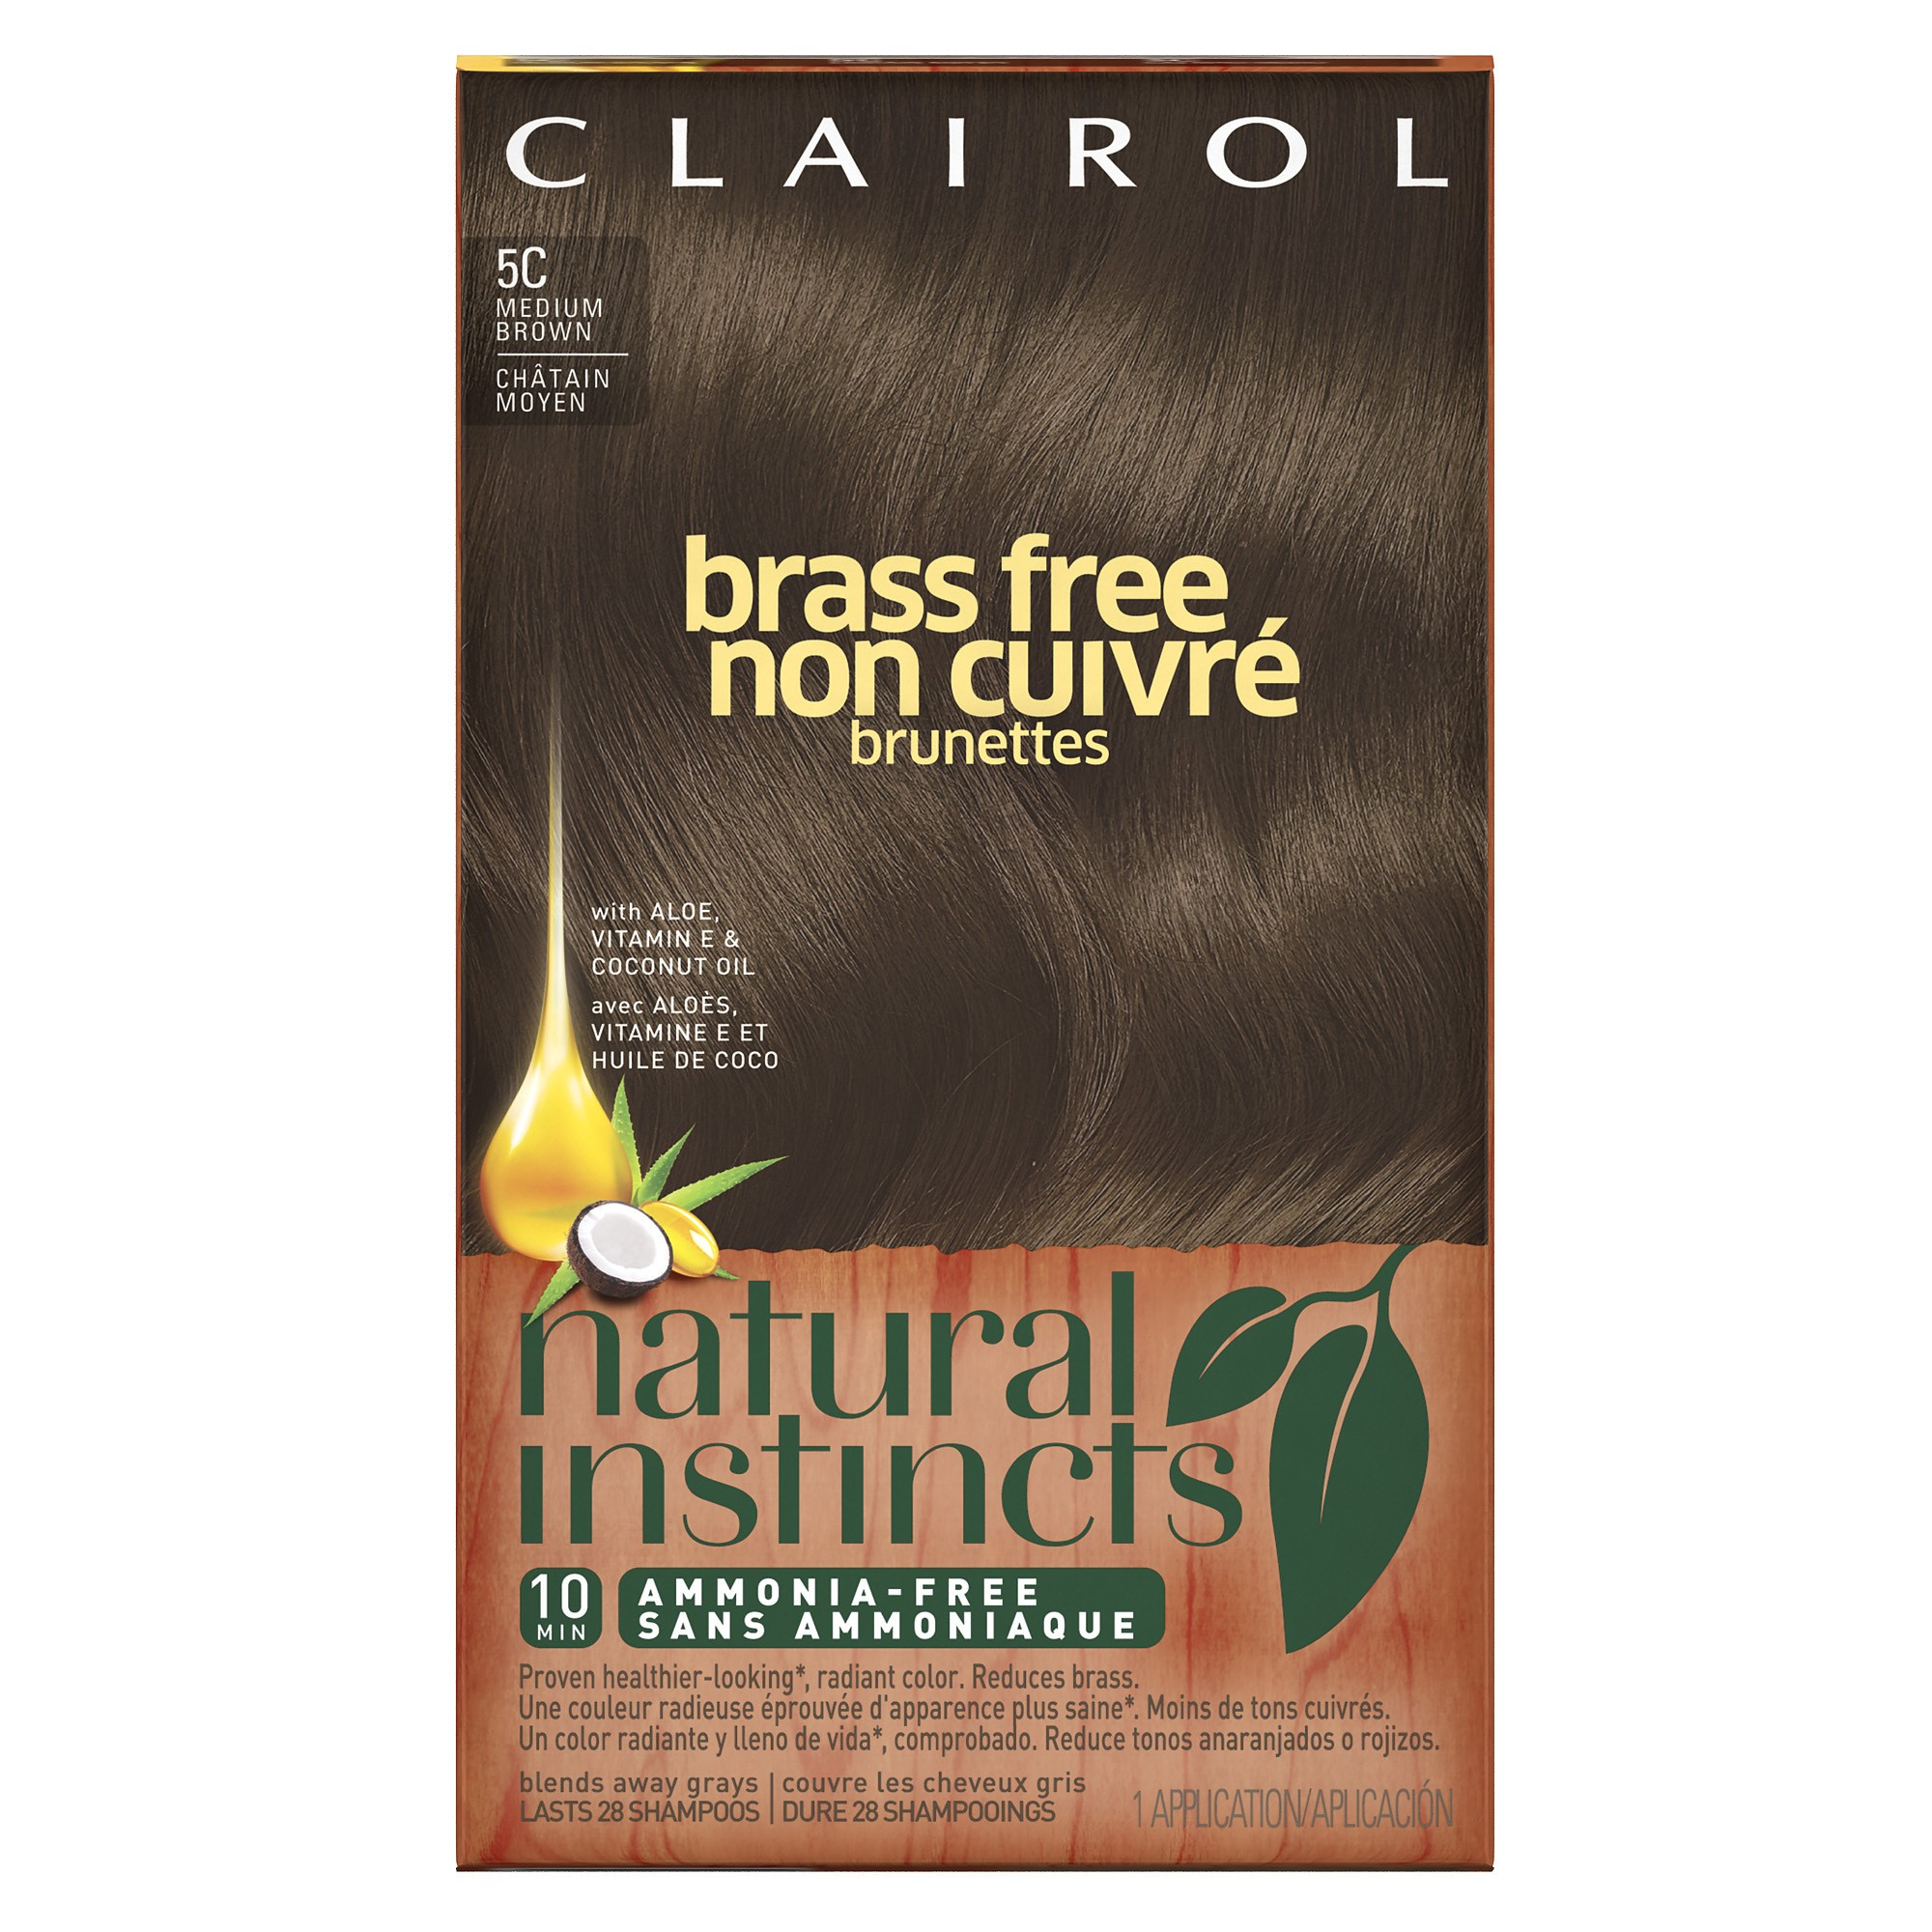 bbd1780053c Clairol Natural Instincts Crème Semi-Permanent Hair Color, Darkest Brown, 31